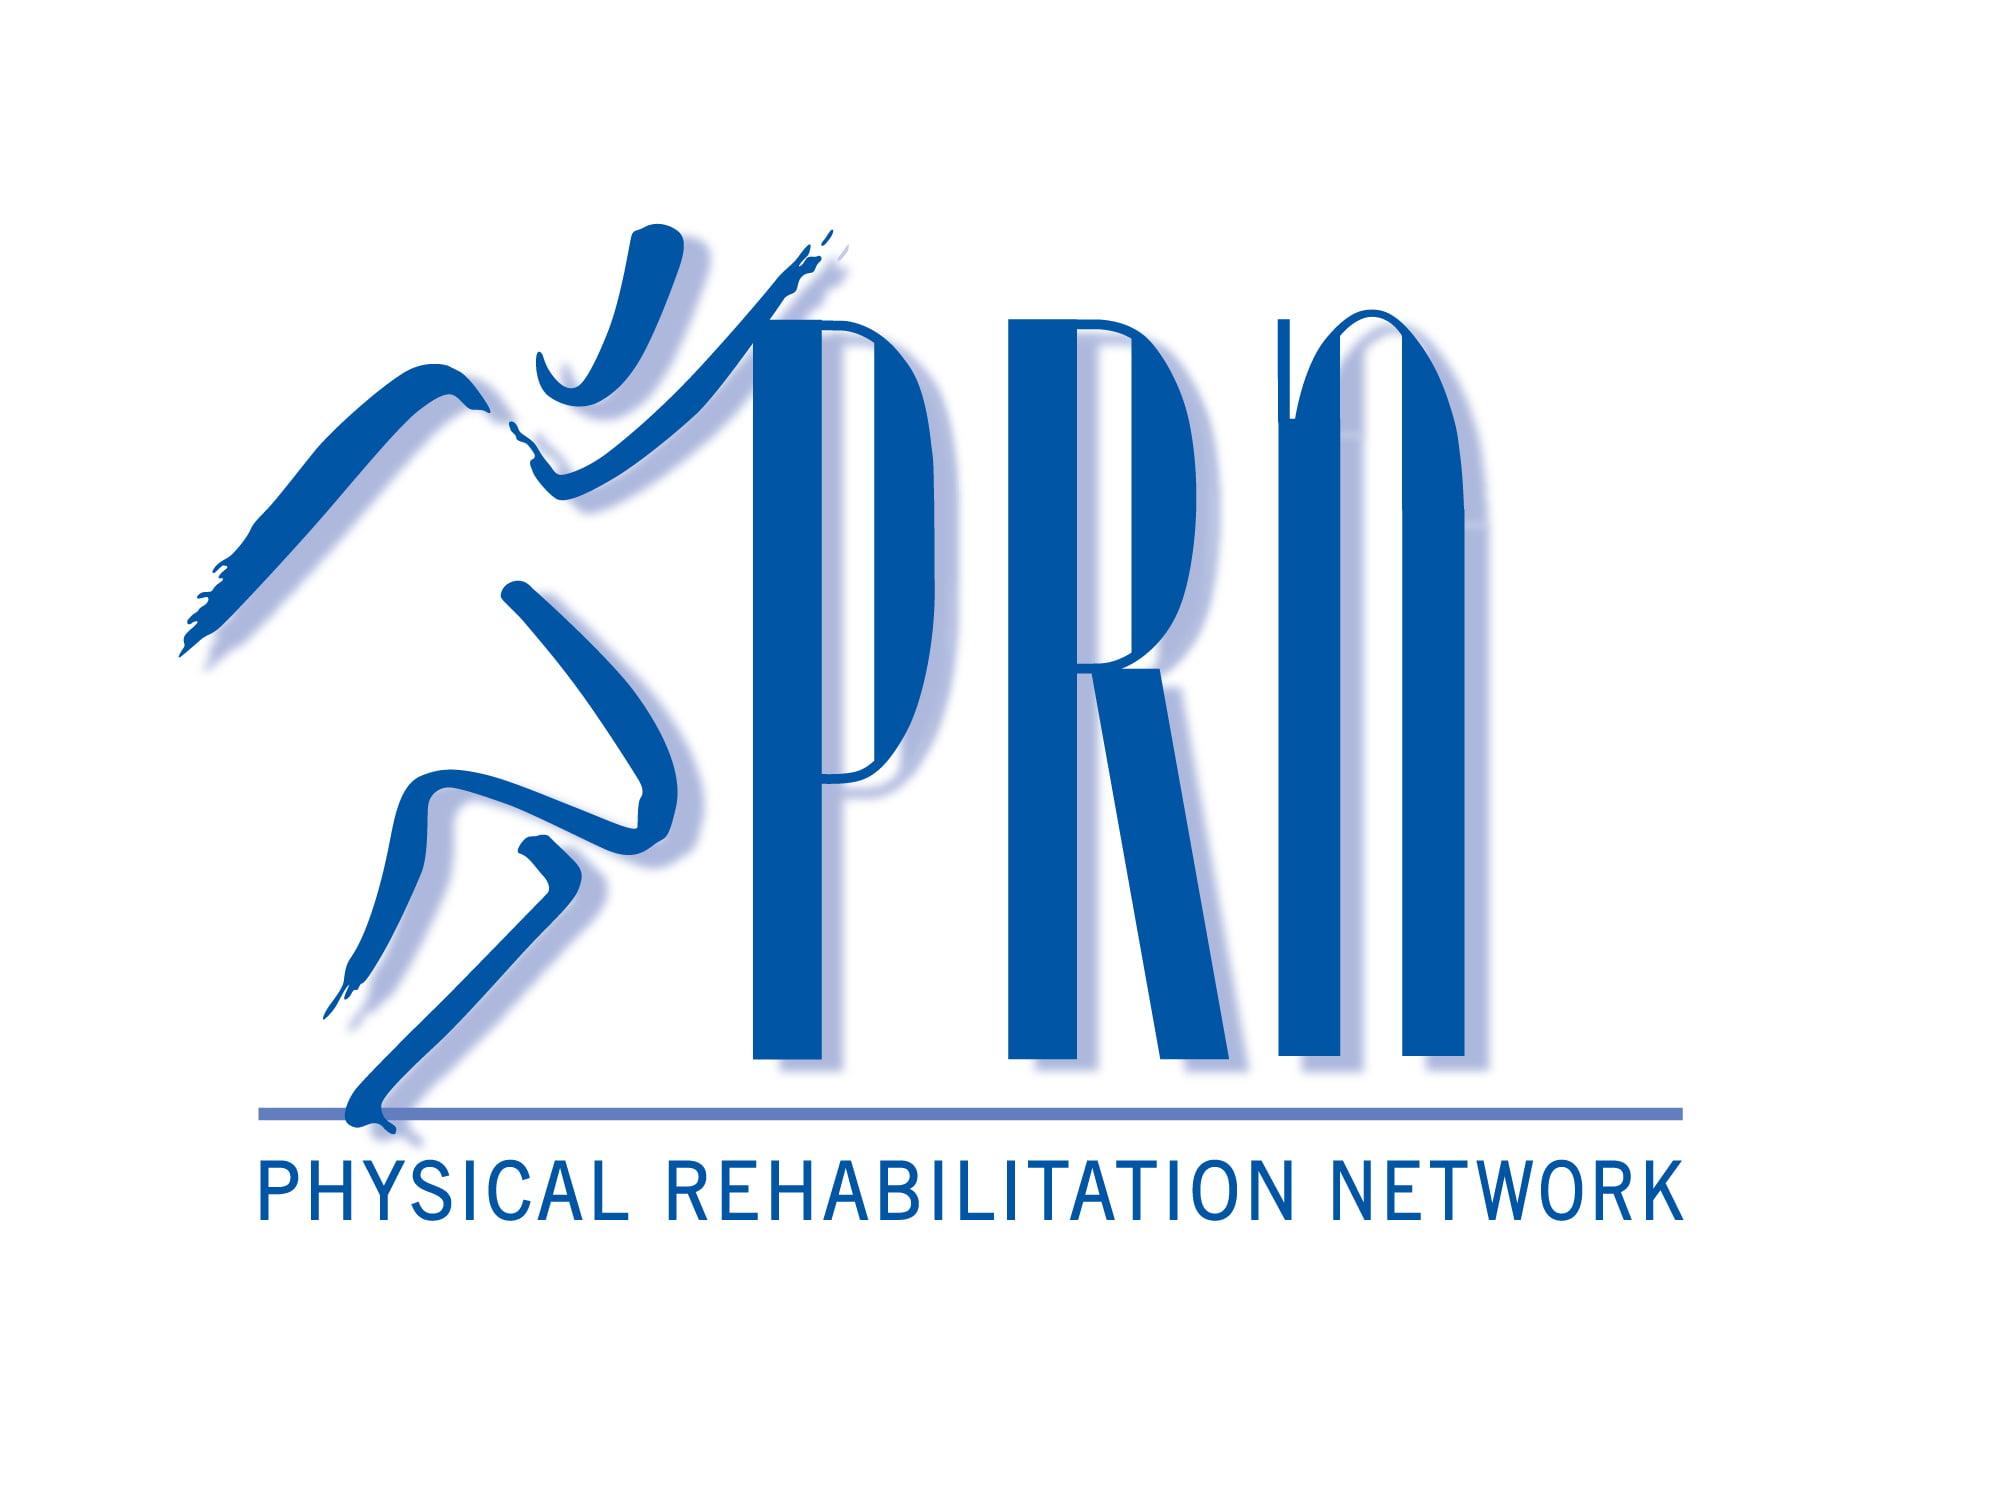 Physical Rehabilitation Network Announces Galen Danielson and Craig Rettke as Regional Vice Presidents